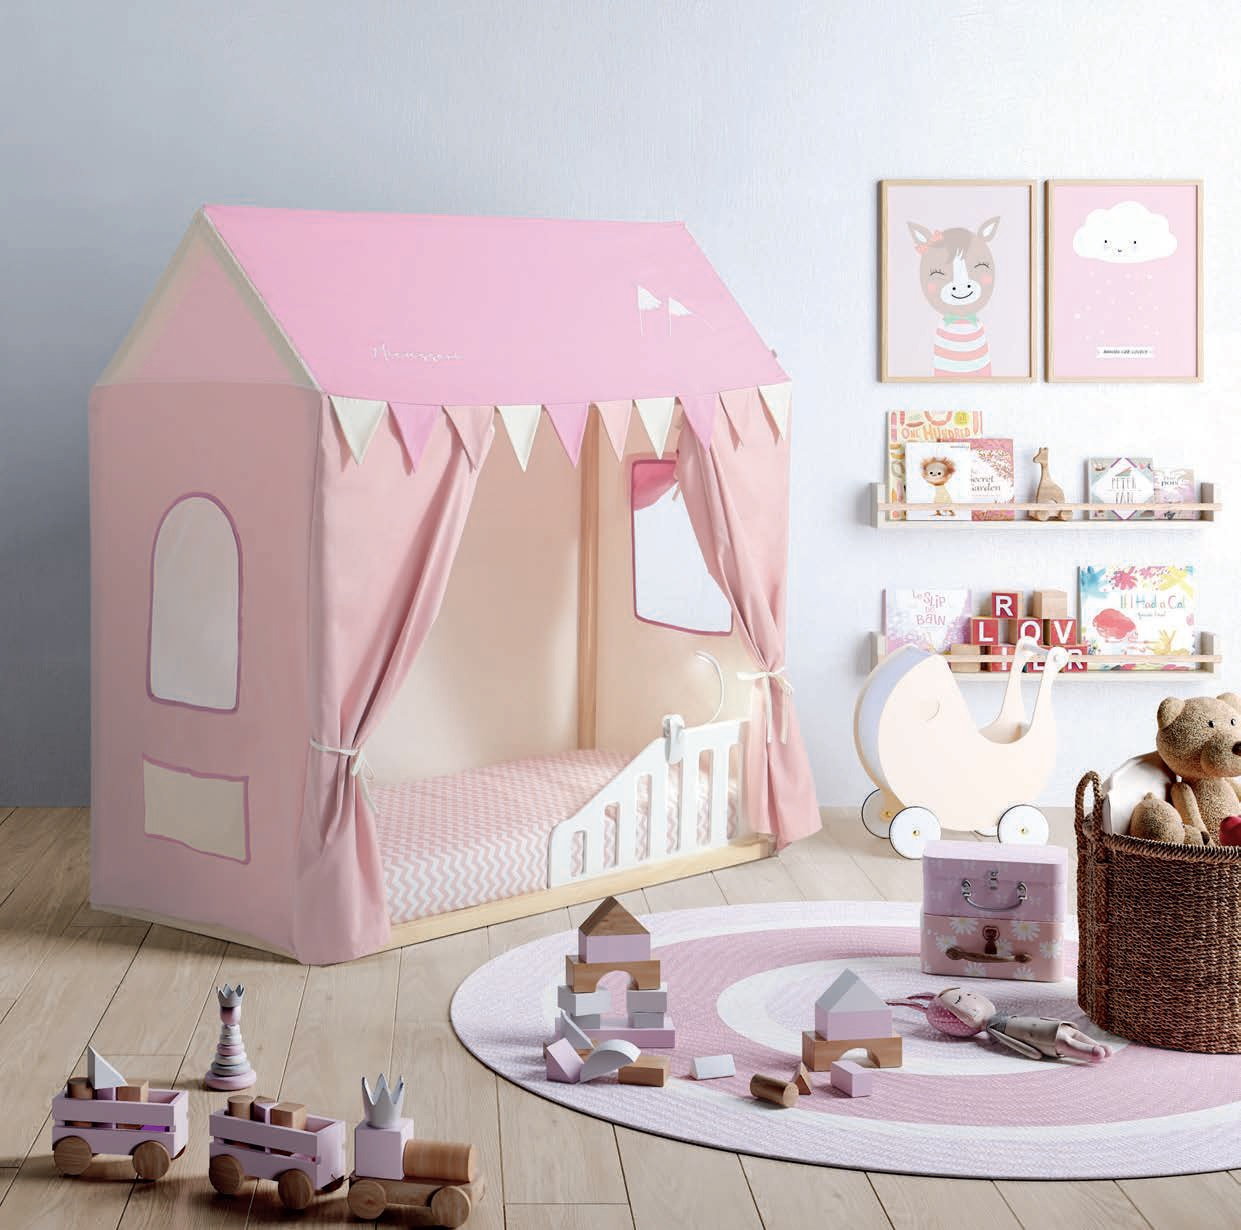 Cama Casita Tippi House Pink Camp (Estructura y Textil Casita)